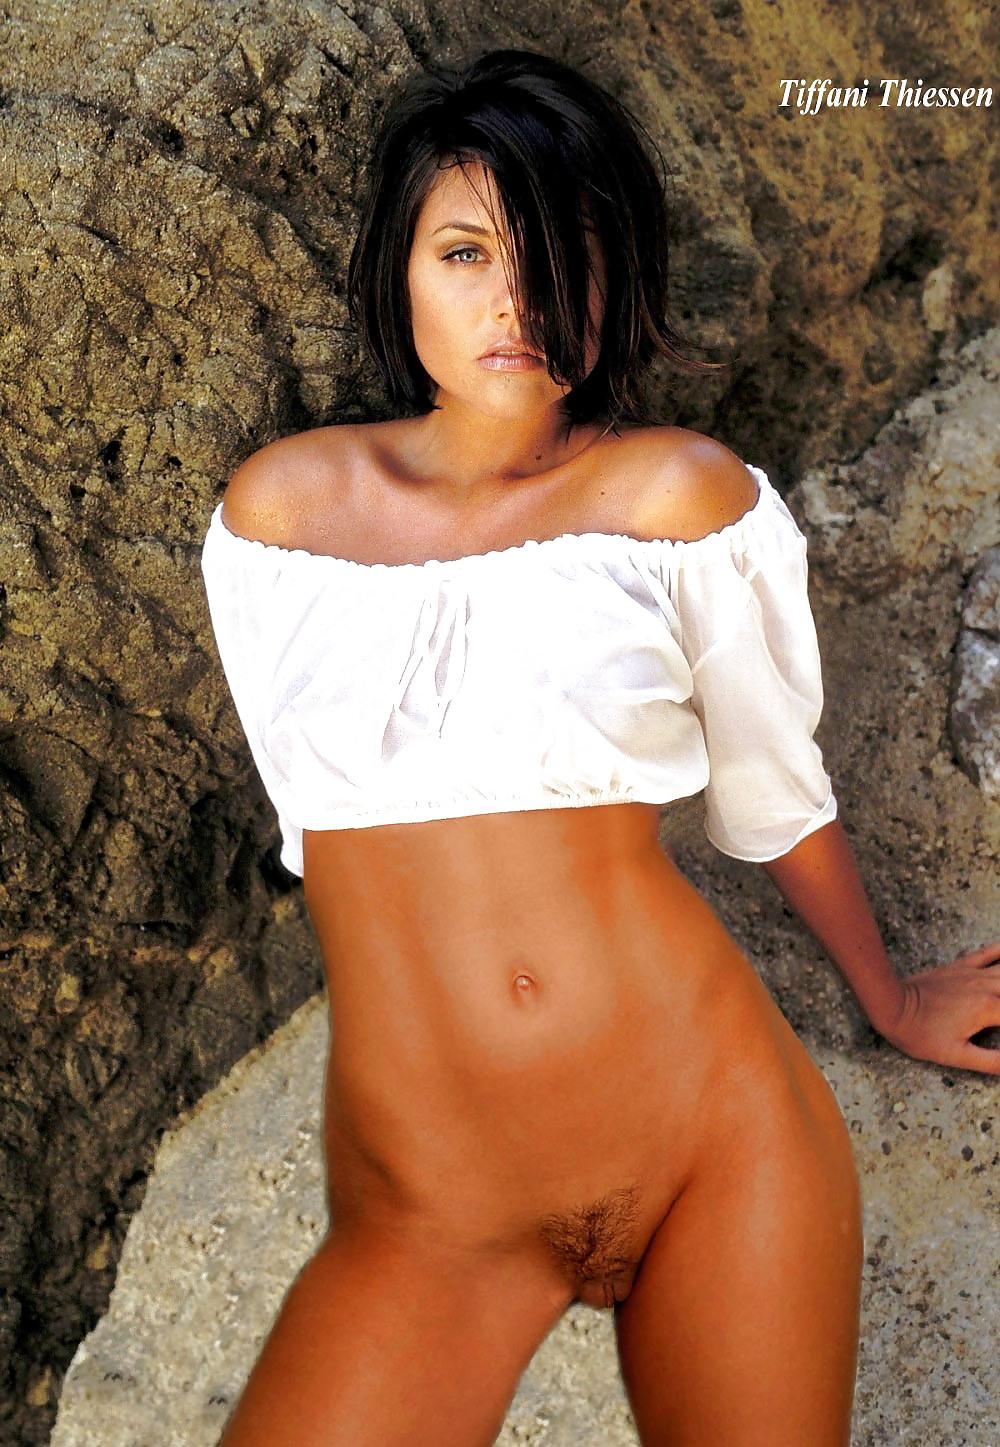 Tiffany amber thiessen nude